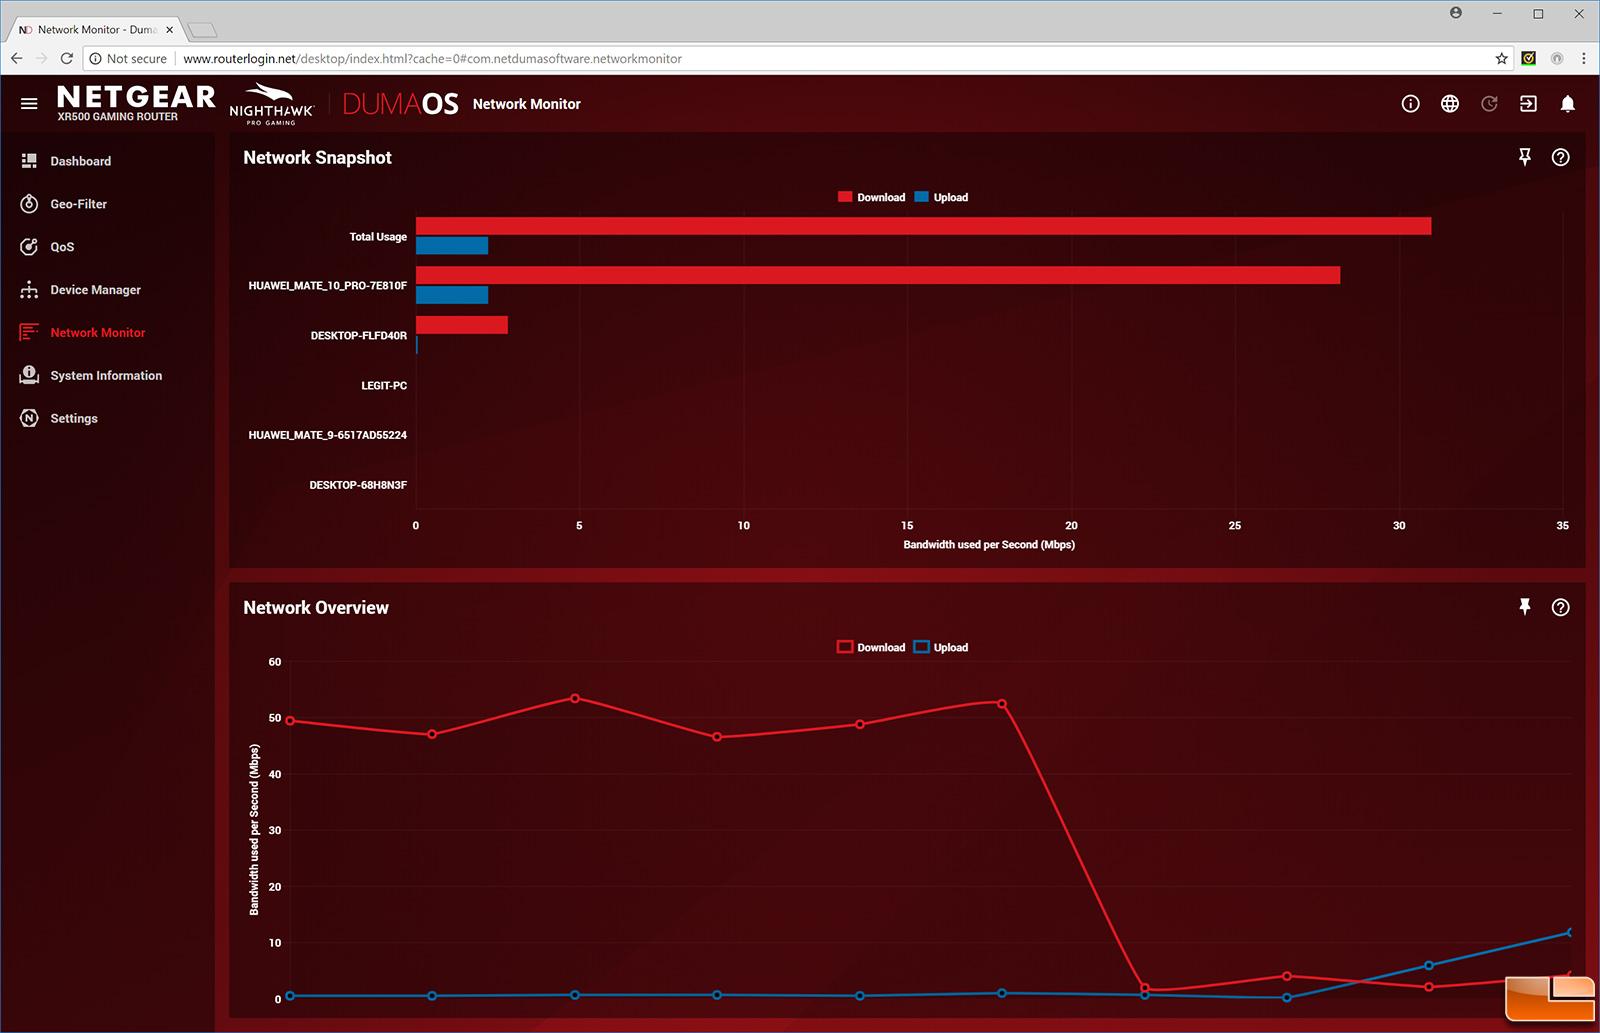 NETGEAR Nighthawk Pro Gaming XR500 WiFi Router Review